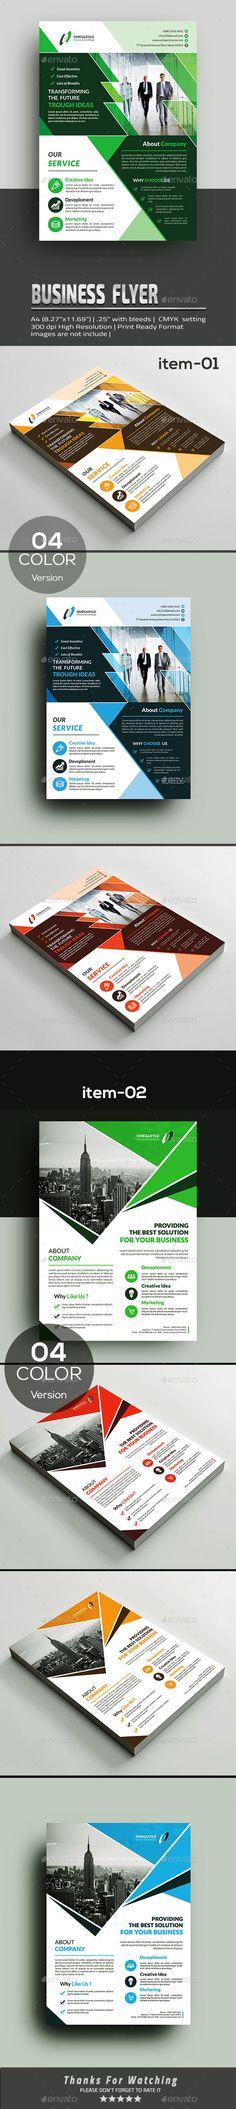 Flyer Bundle 2in1 - Corporate Flyers Business Flyer Templates, Corporate Flyer, Color Shapes, Clean Design, Business Planning, Print Design, Graphic Design, Color Change, Advertising Agency